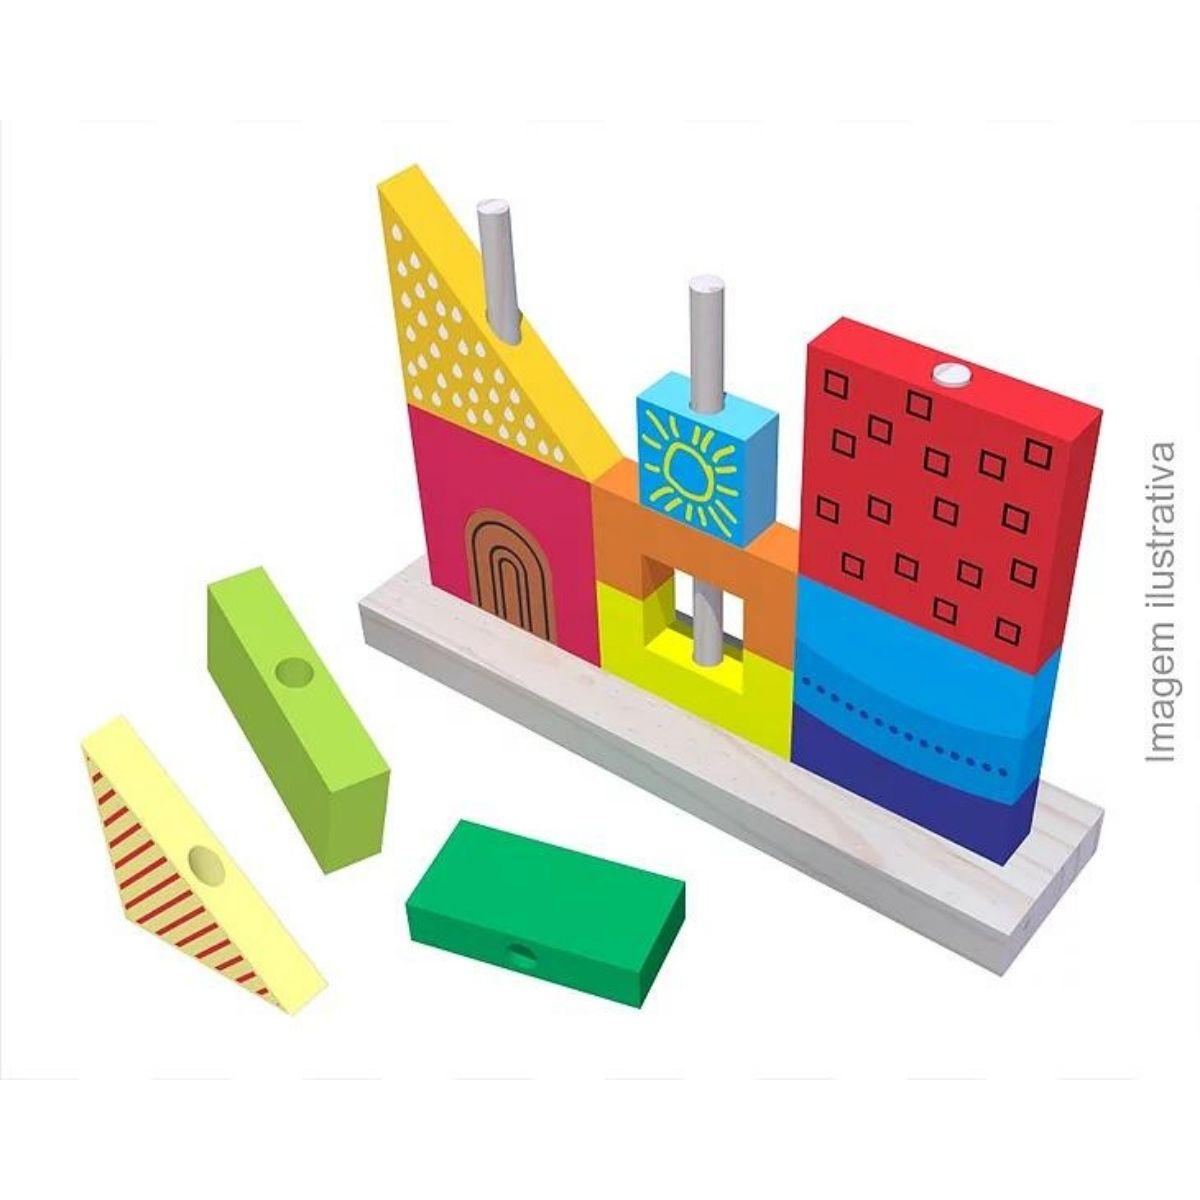 Brinquedo Montessori Educativo  Encaixe Vertical